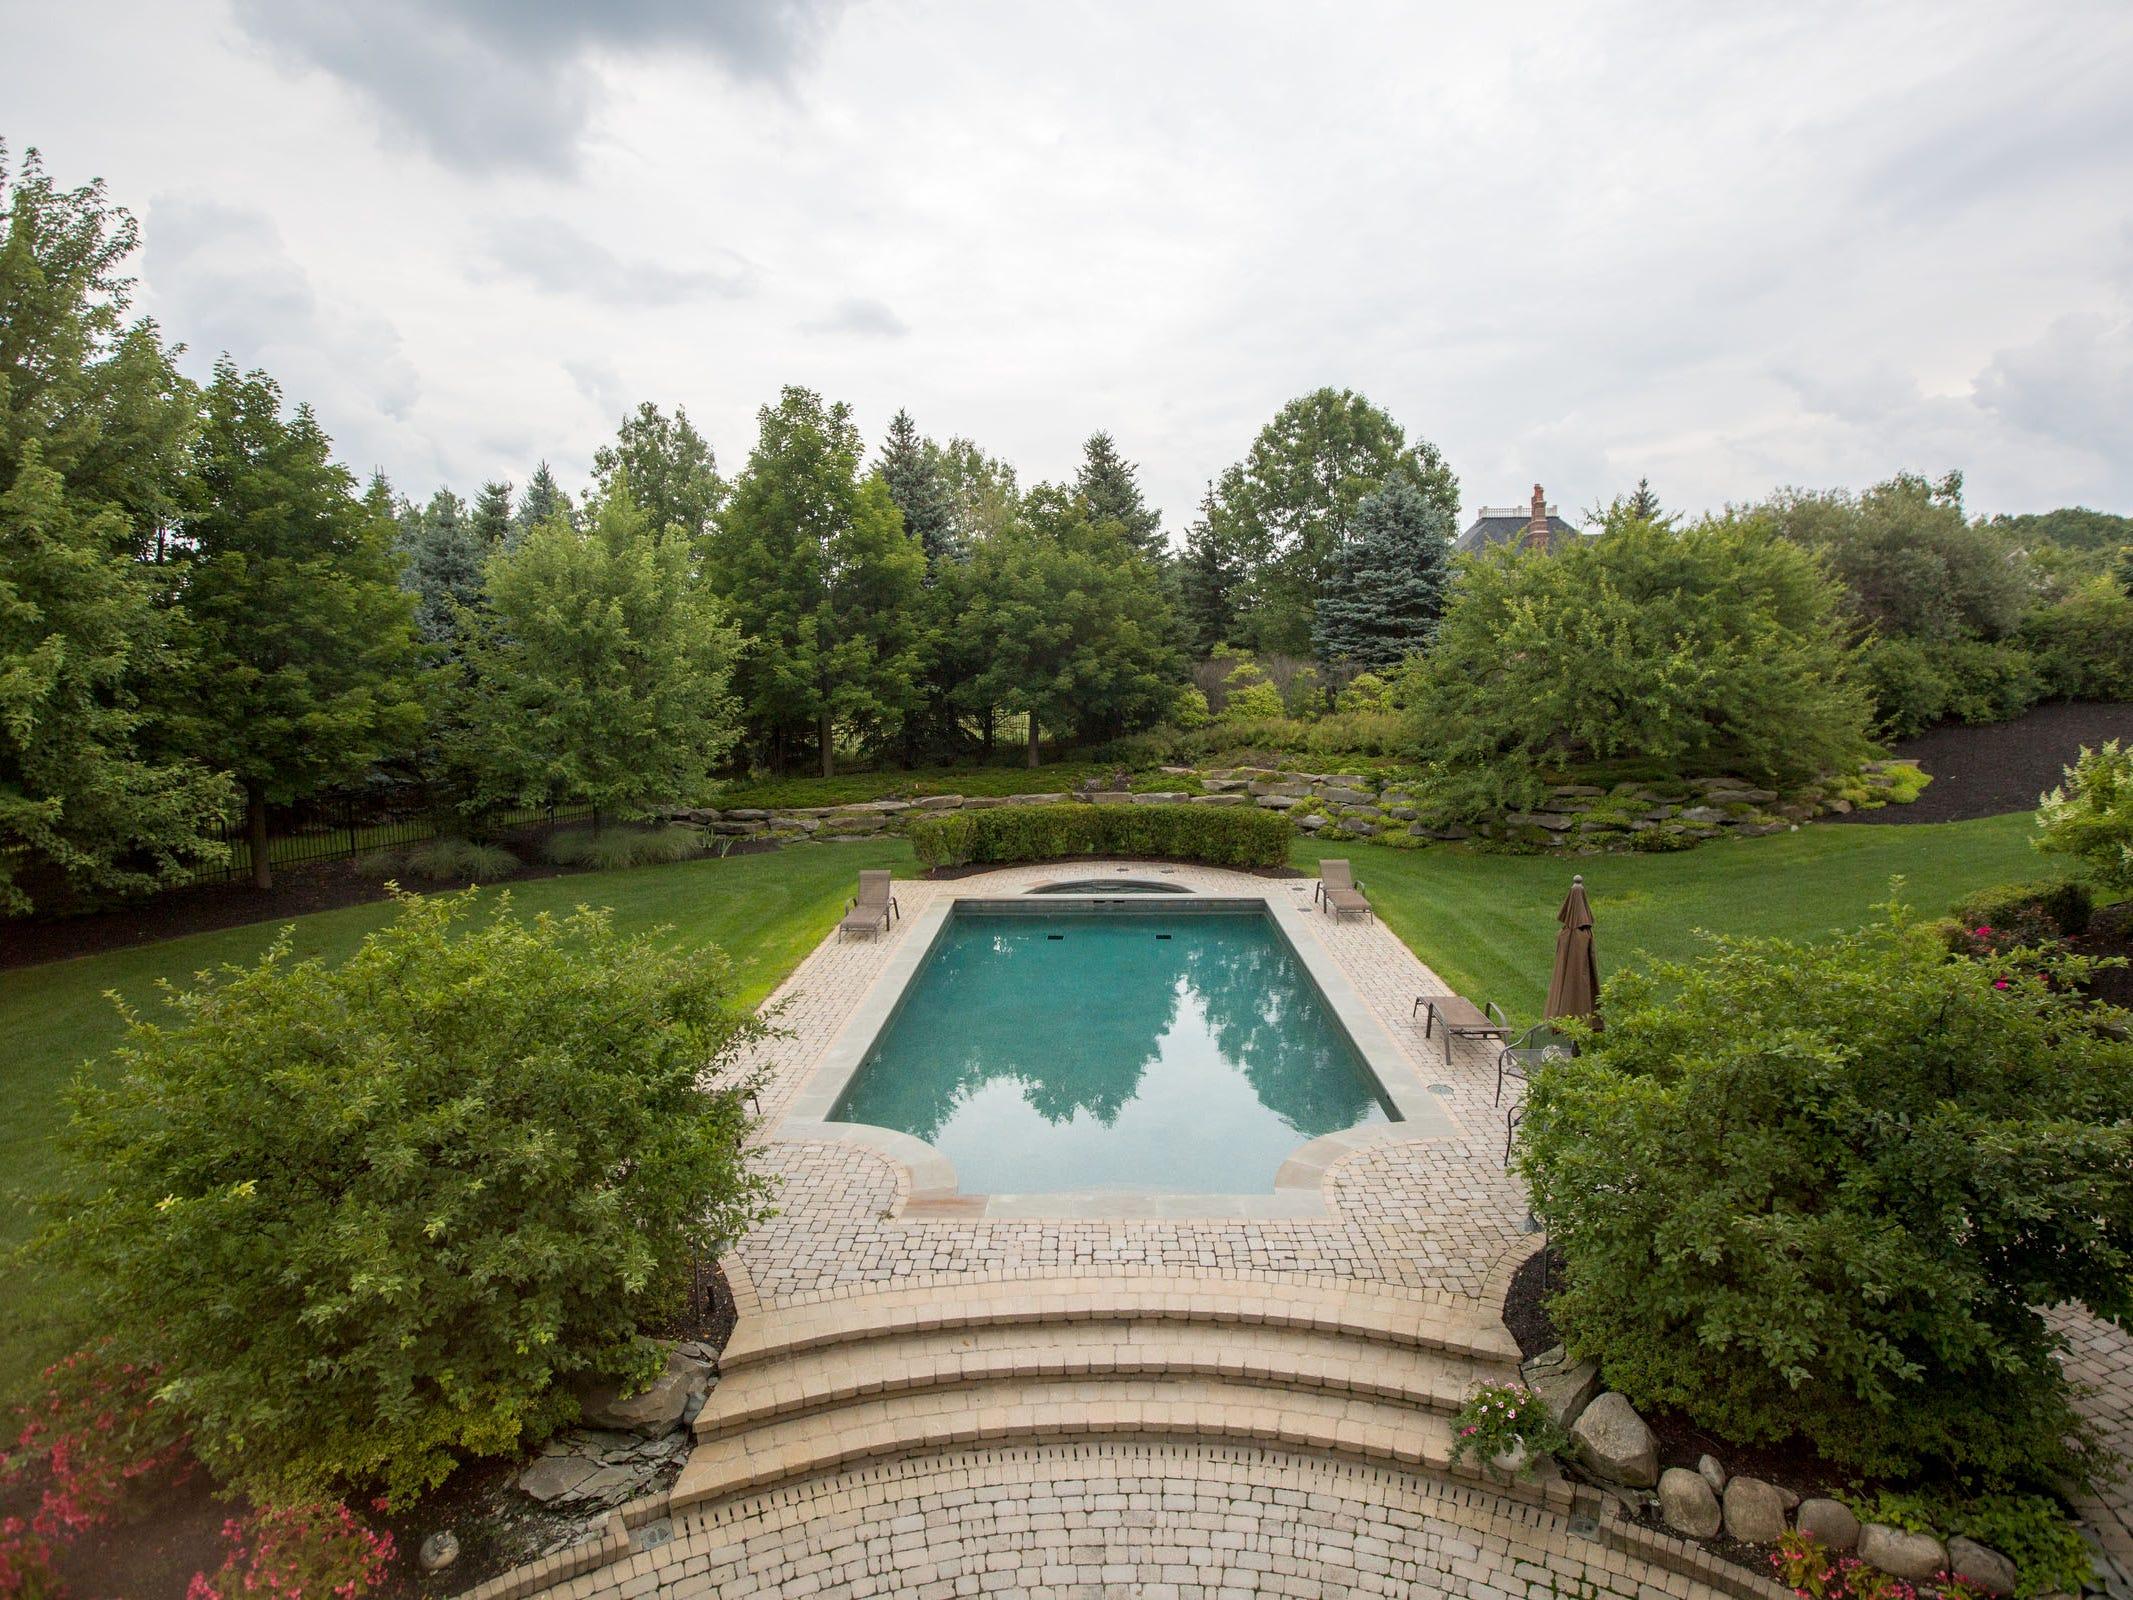 Belgian brick surrounds the pool.